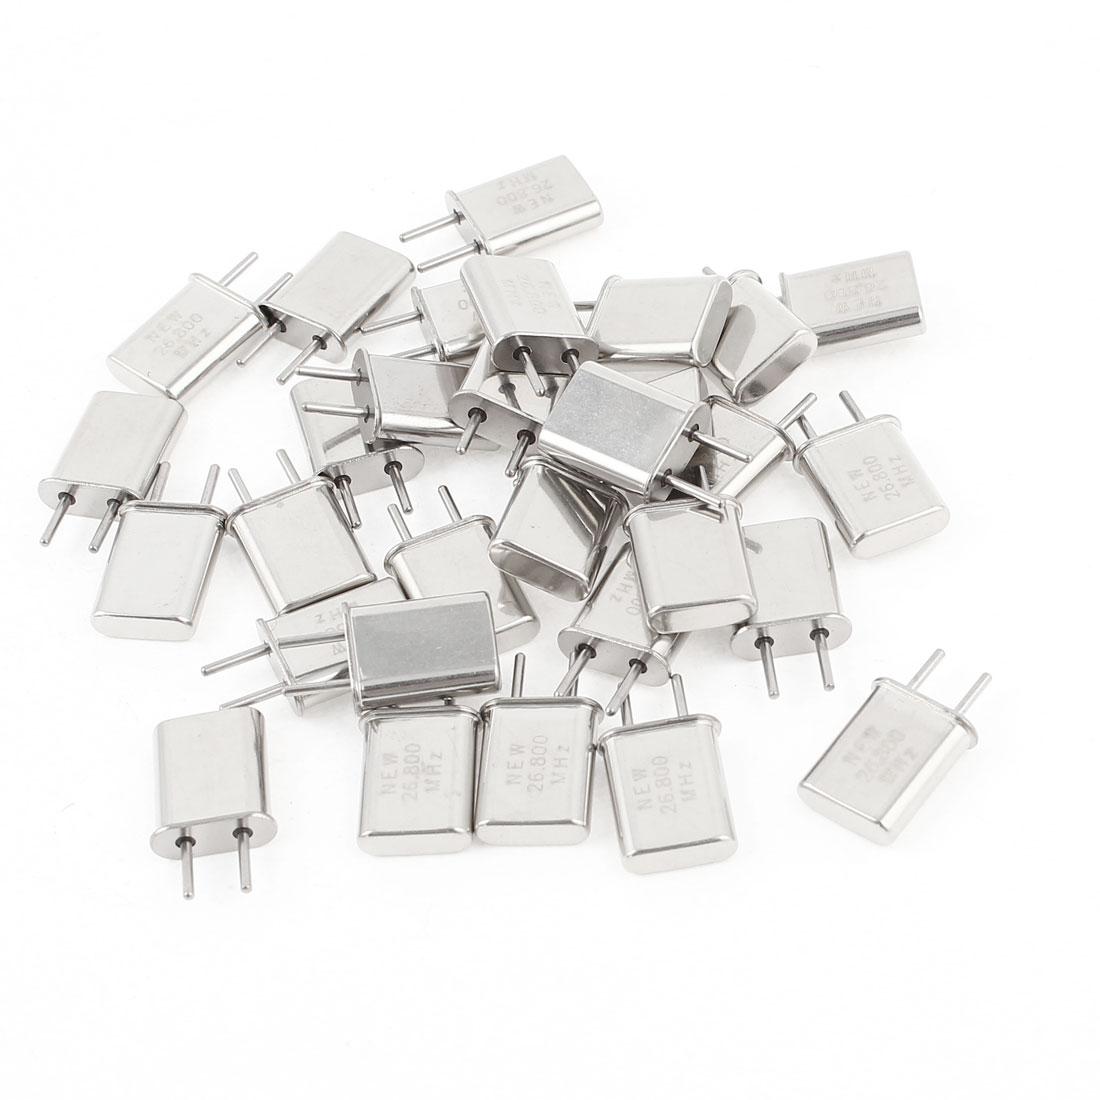 30 Pieces 26.800Mhz 26.800M Passive Quartz Crystal Oscillator Silver Tone HC-49U